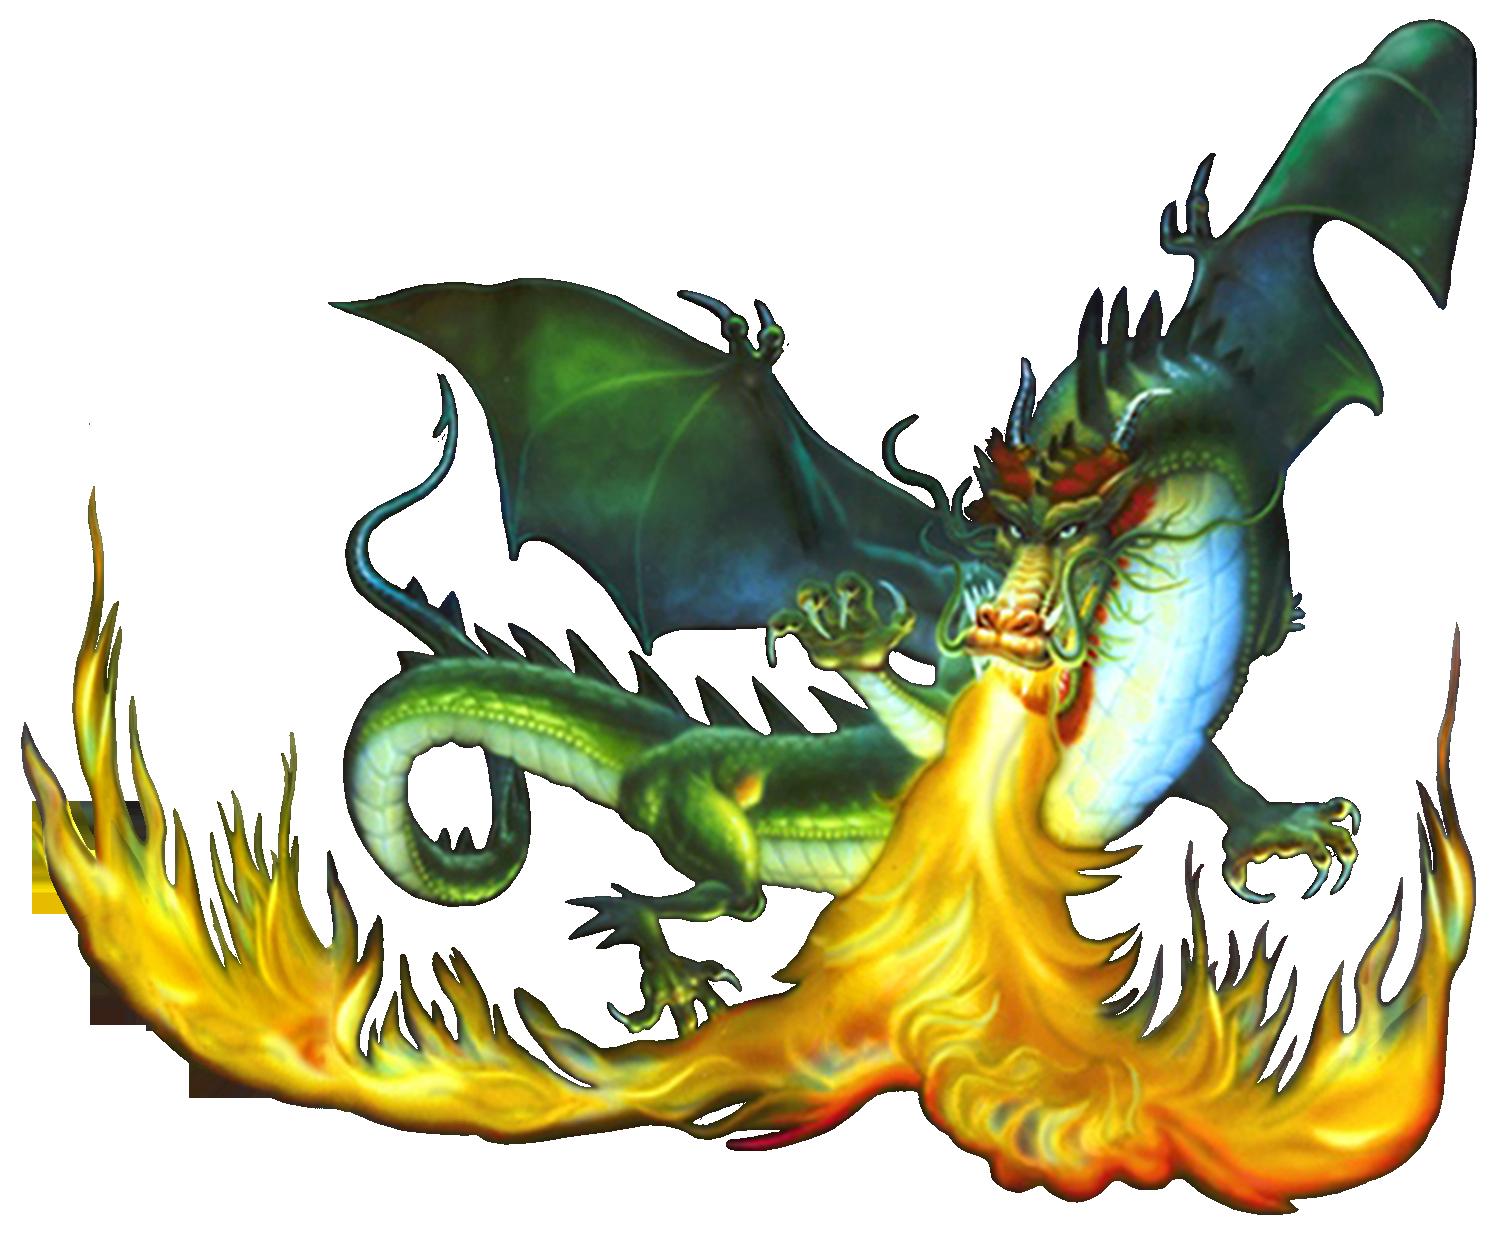 Firebreathing Dragon #1380502 - Fire Breathing Dragon PNG HD